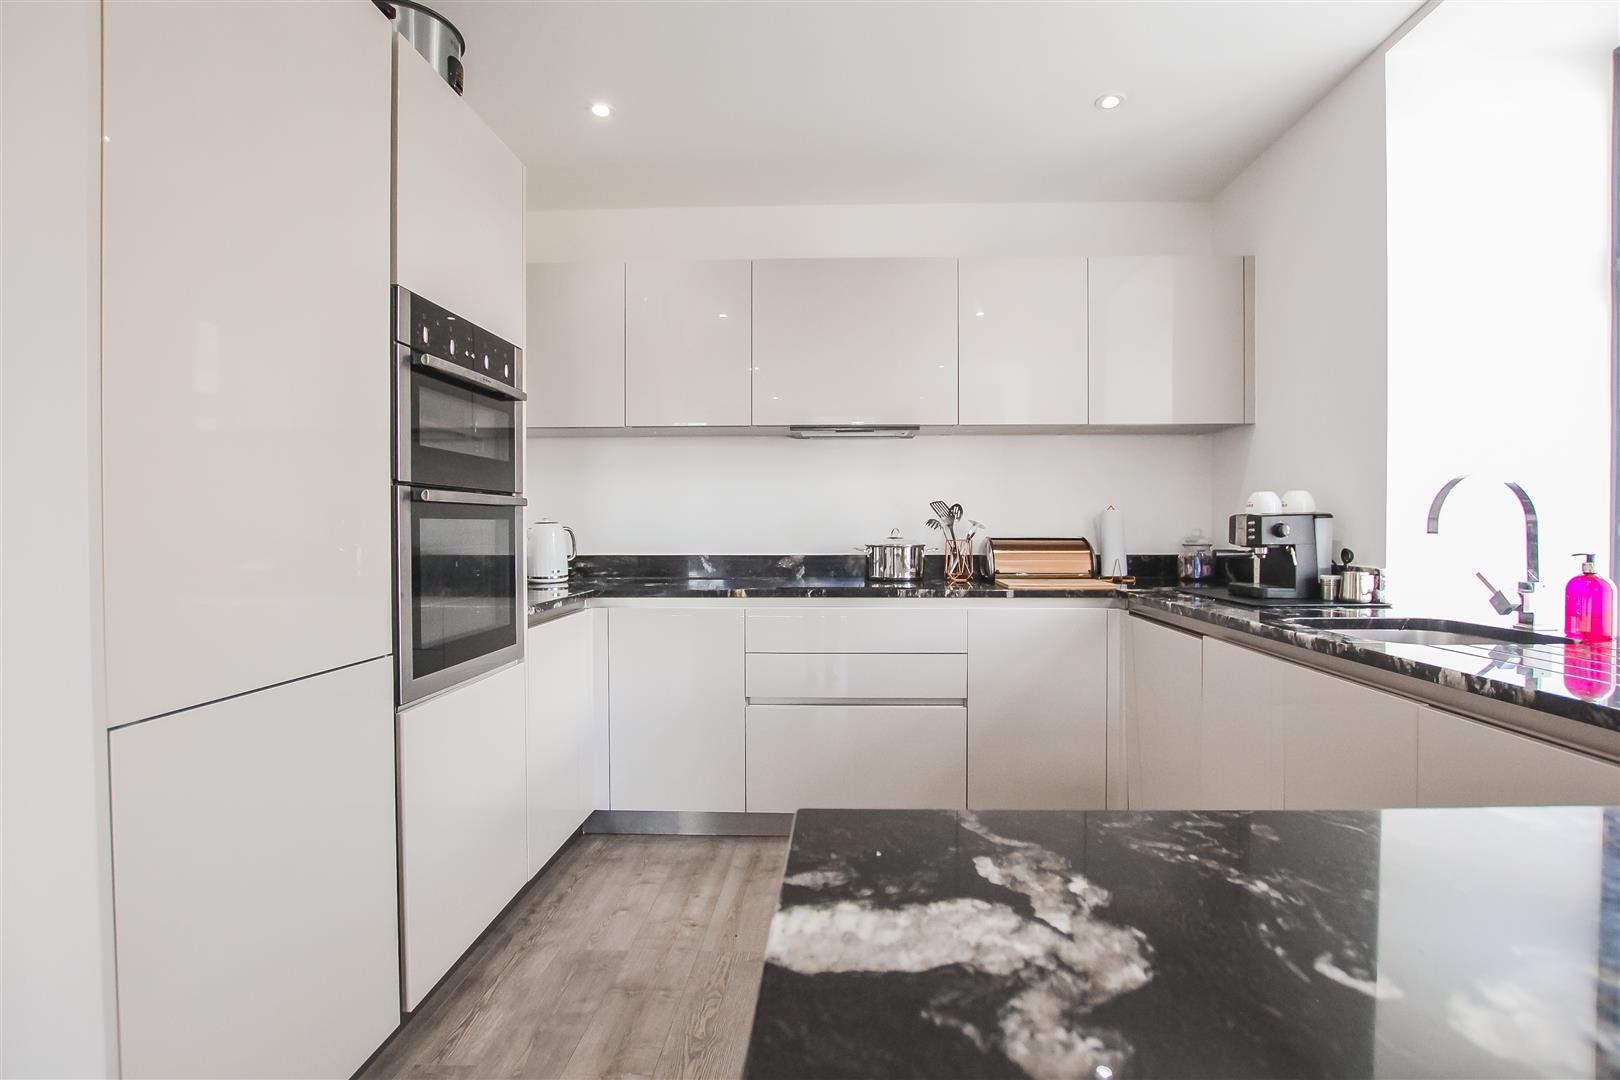 3 Bedroom Duplex Apartment For Sale - Image 2